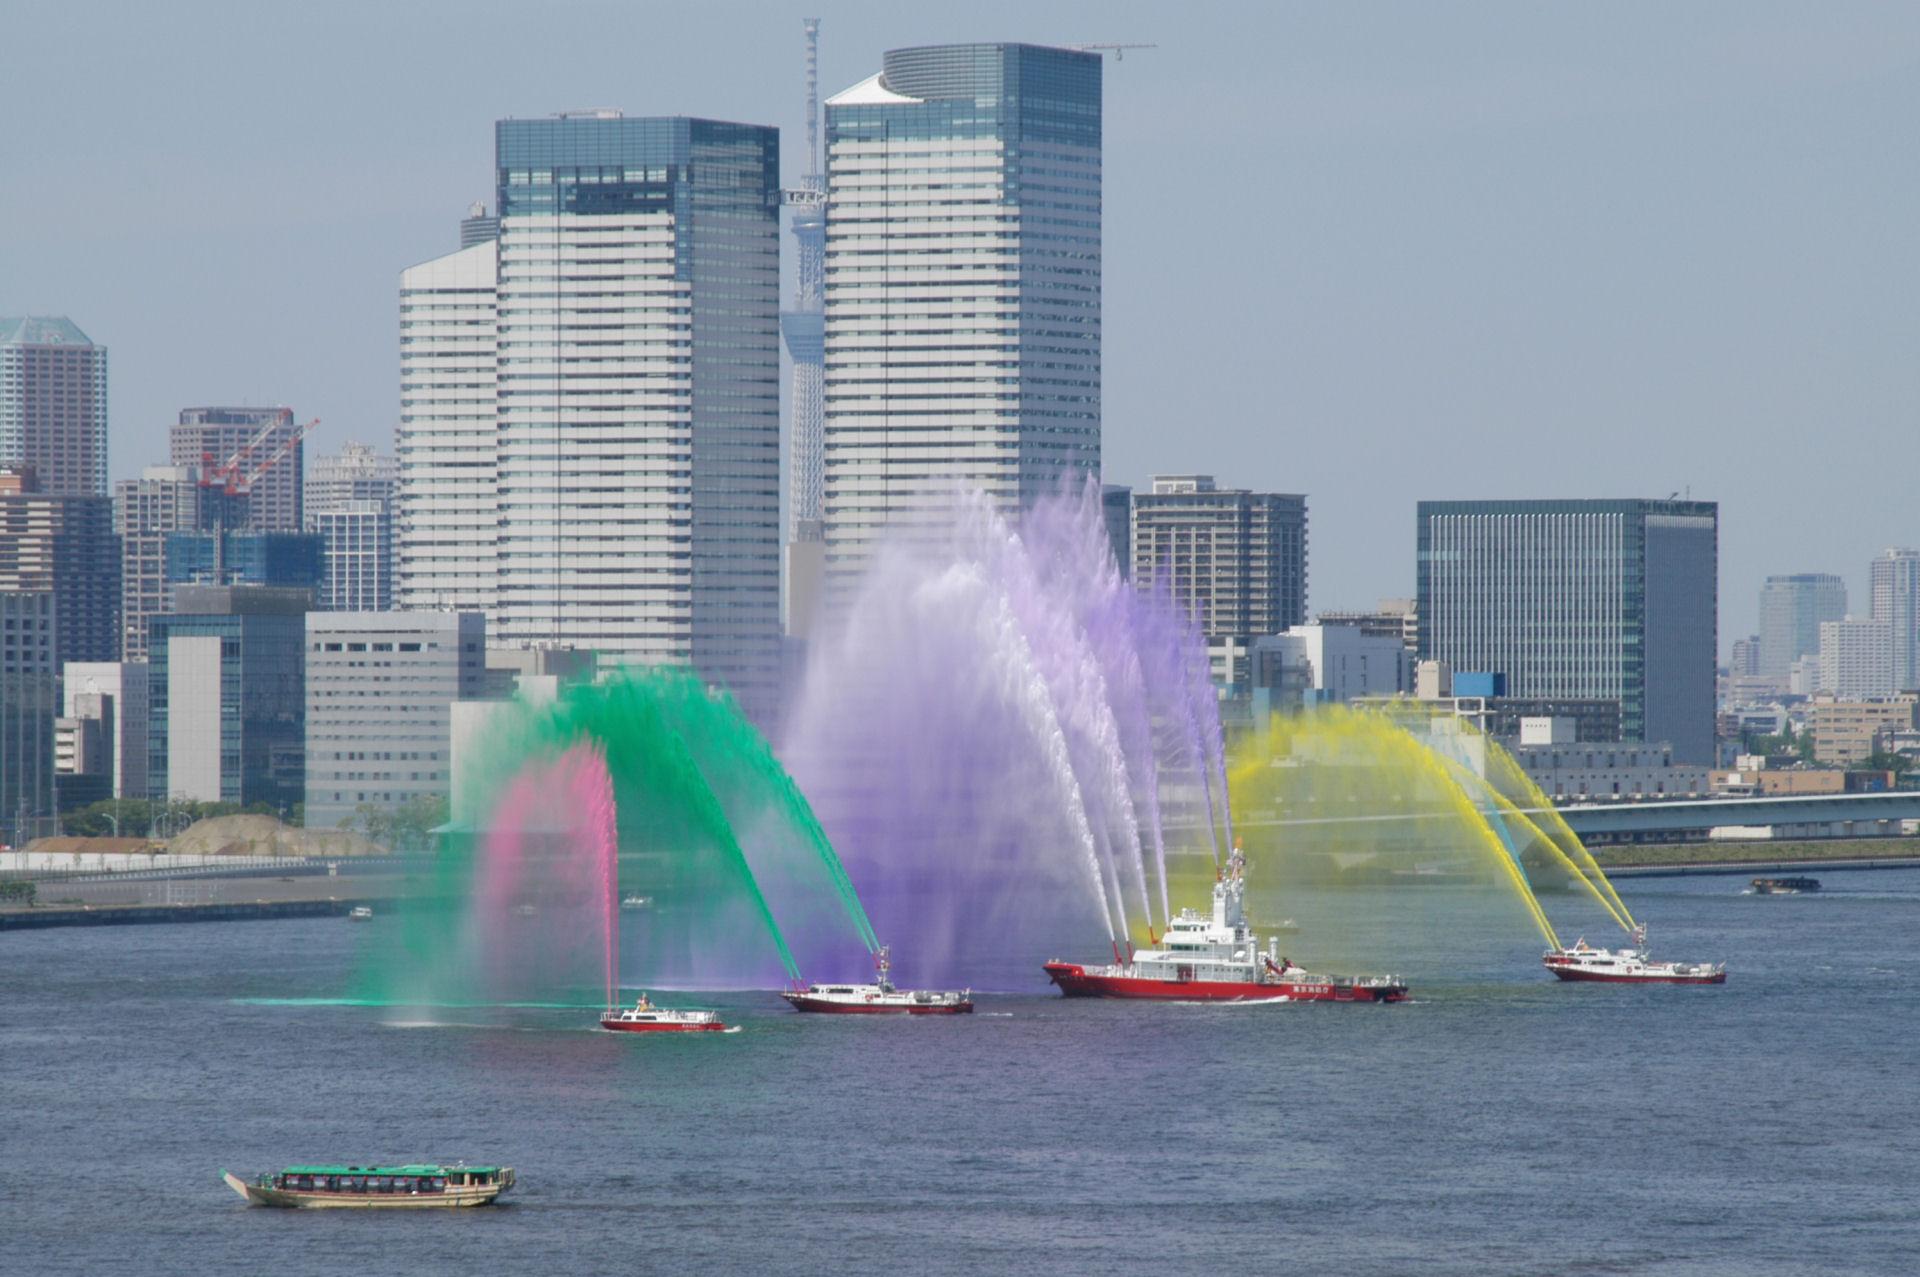 rainbowharumi0165.jpg